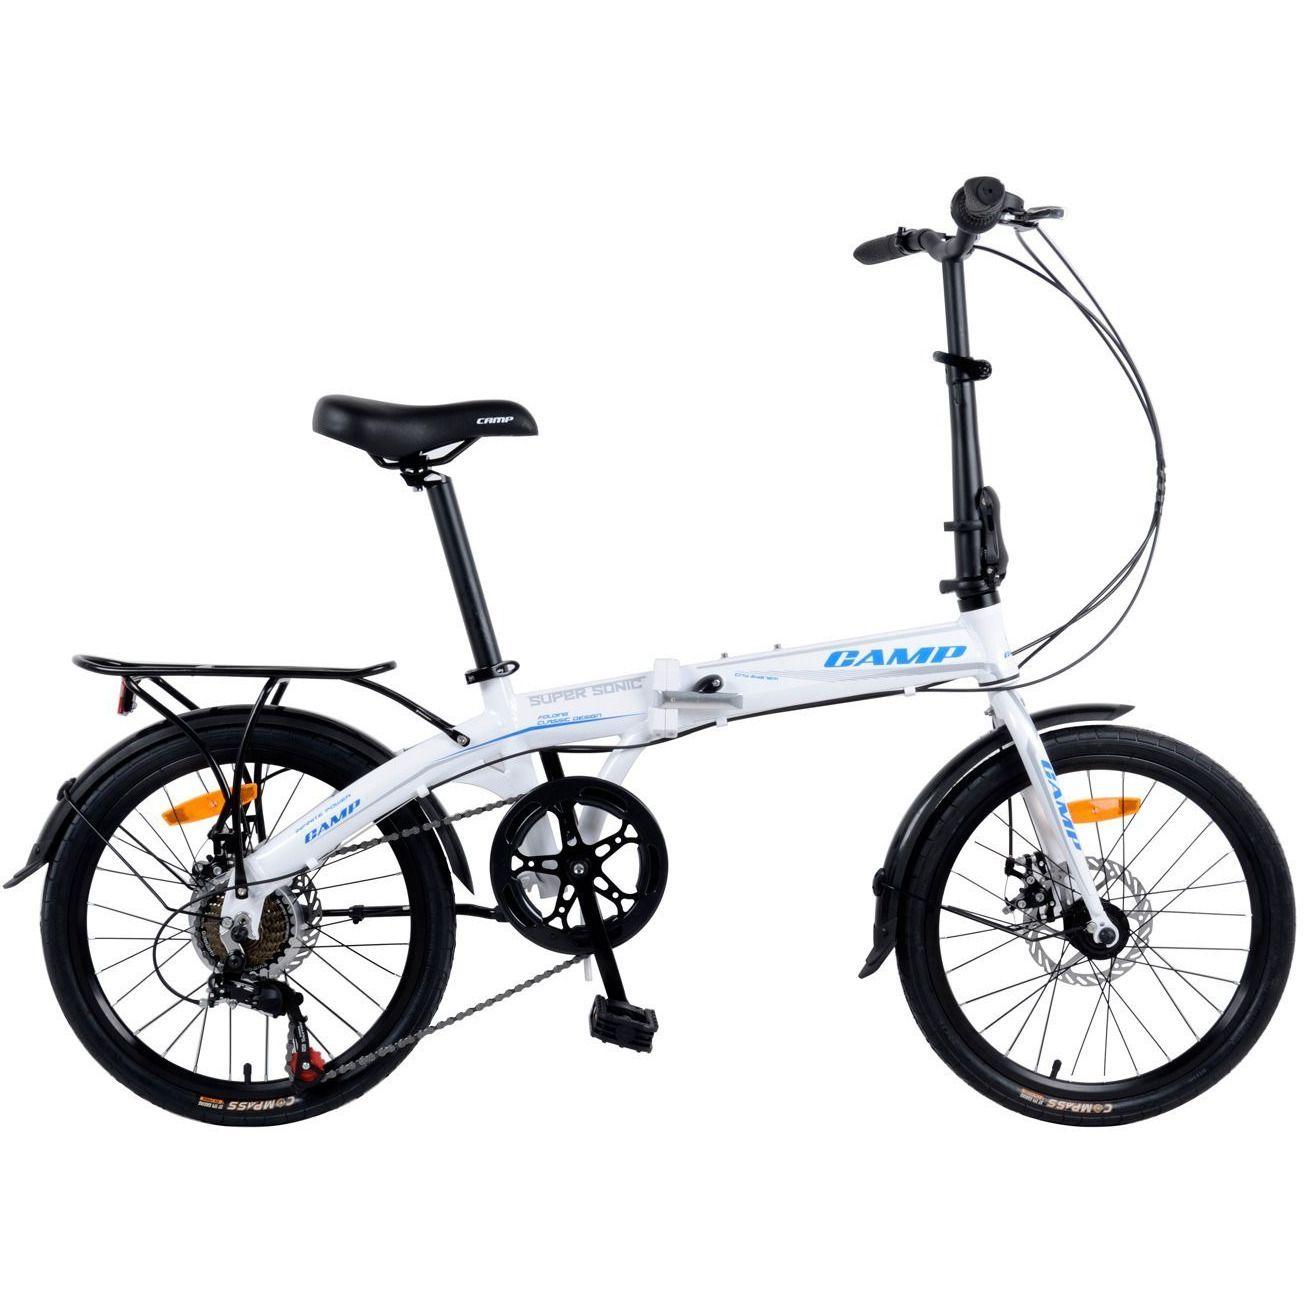 Mantis Flex Folding Bike